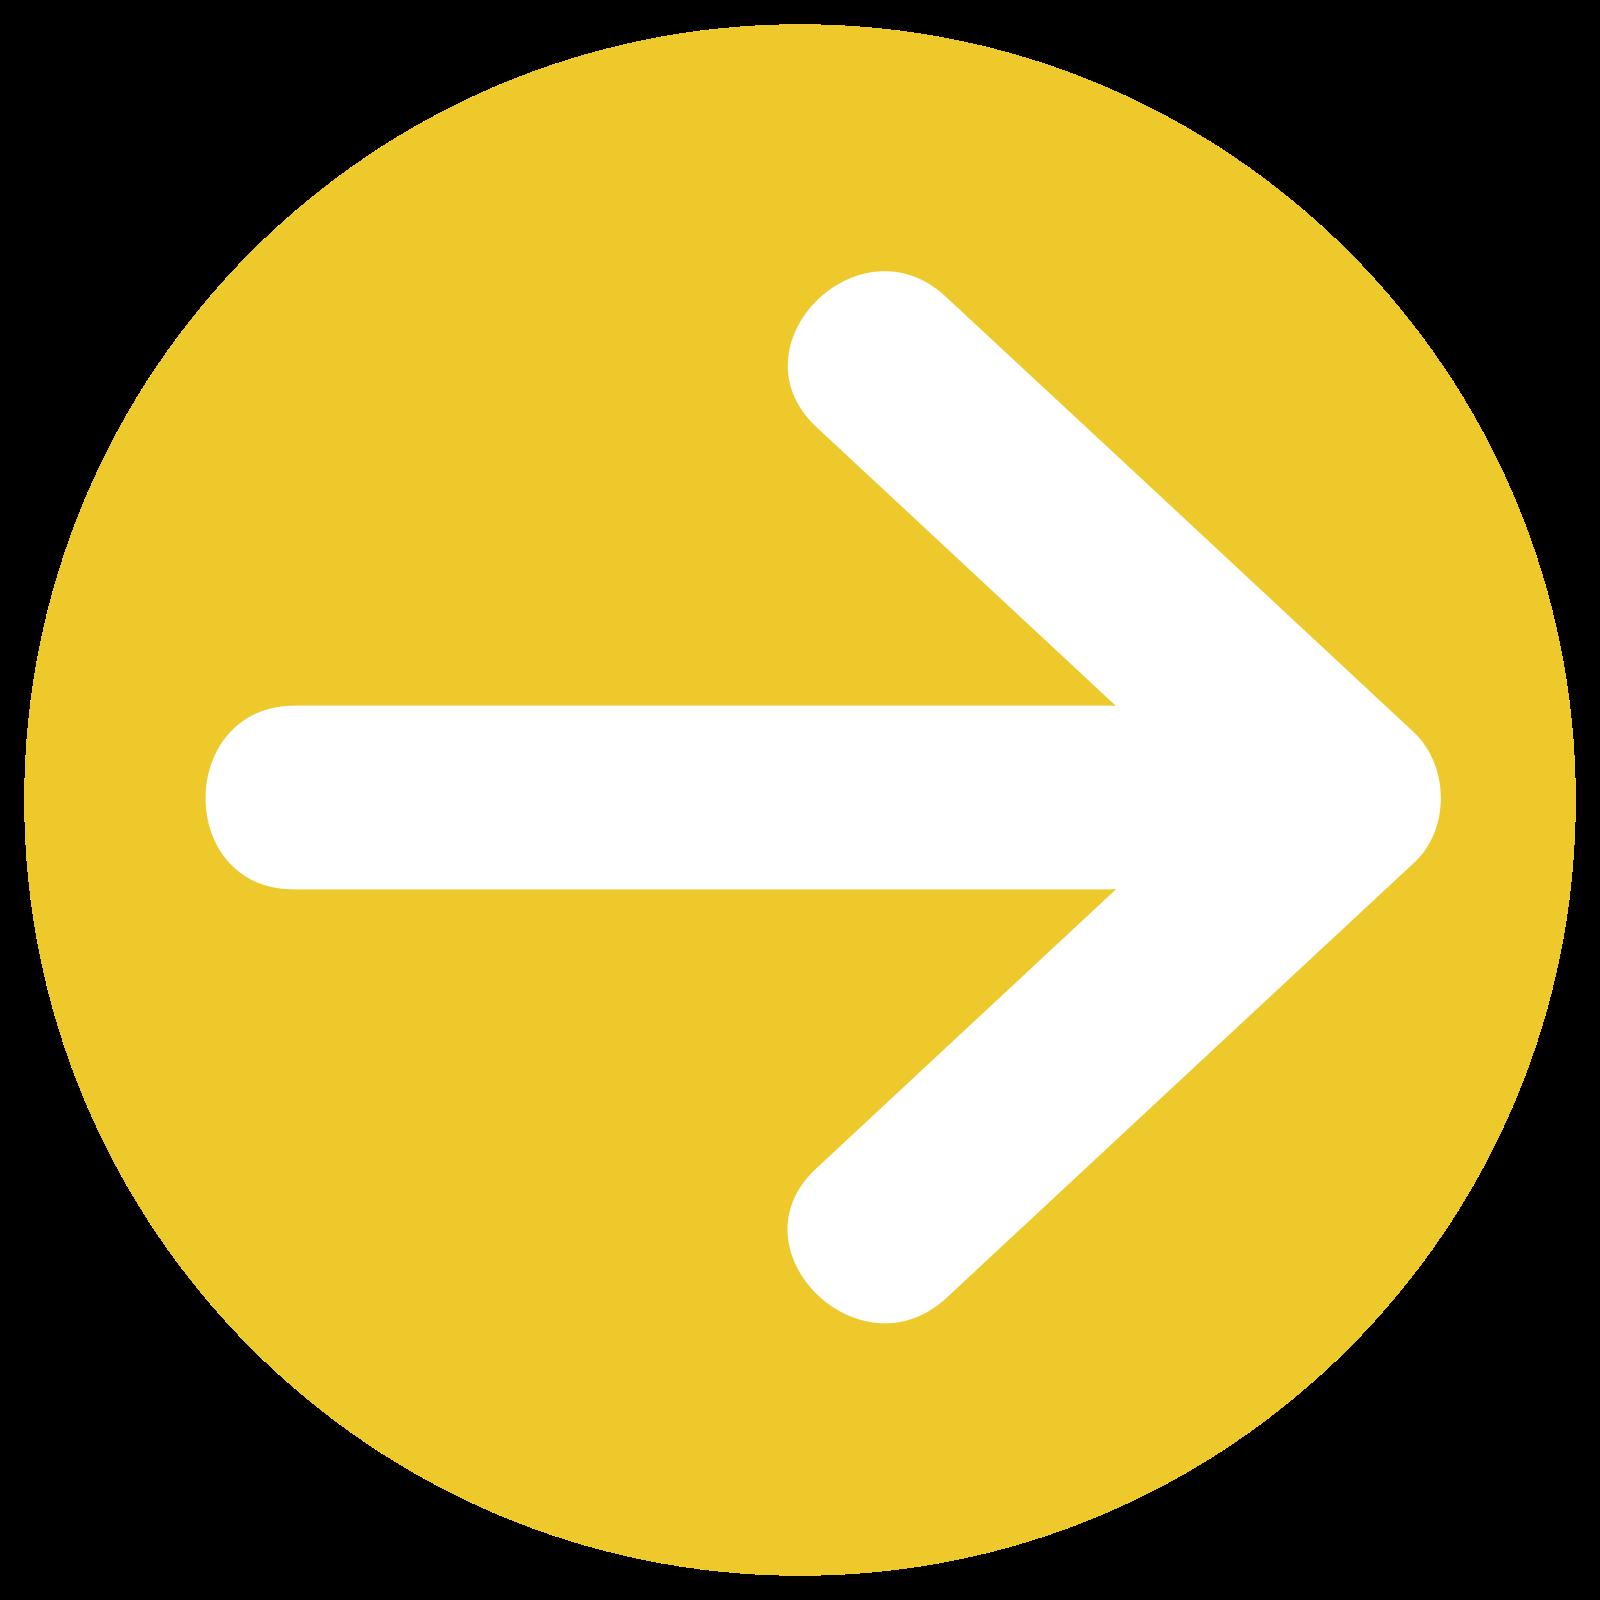 Wide Right Arrow icon